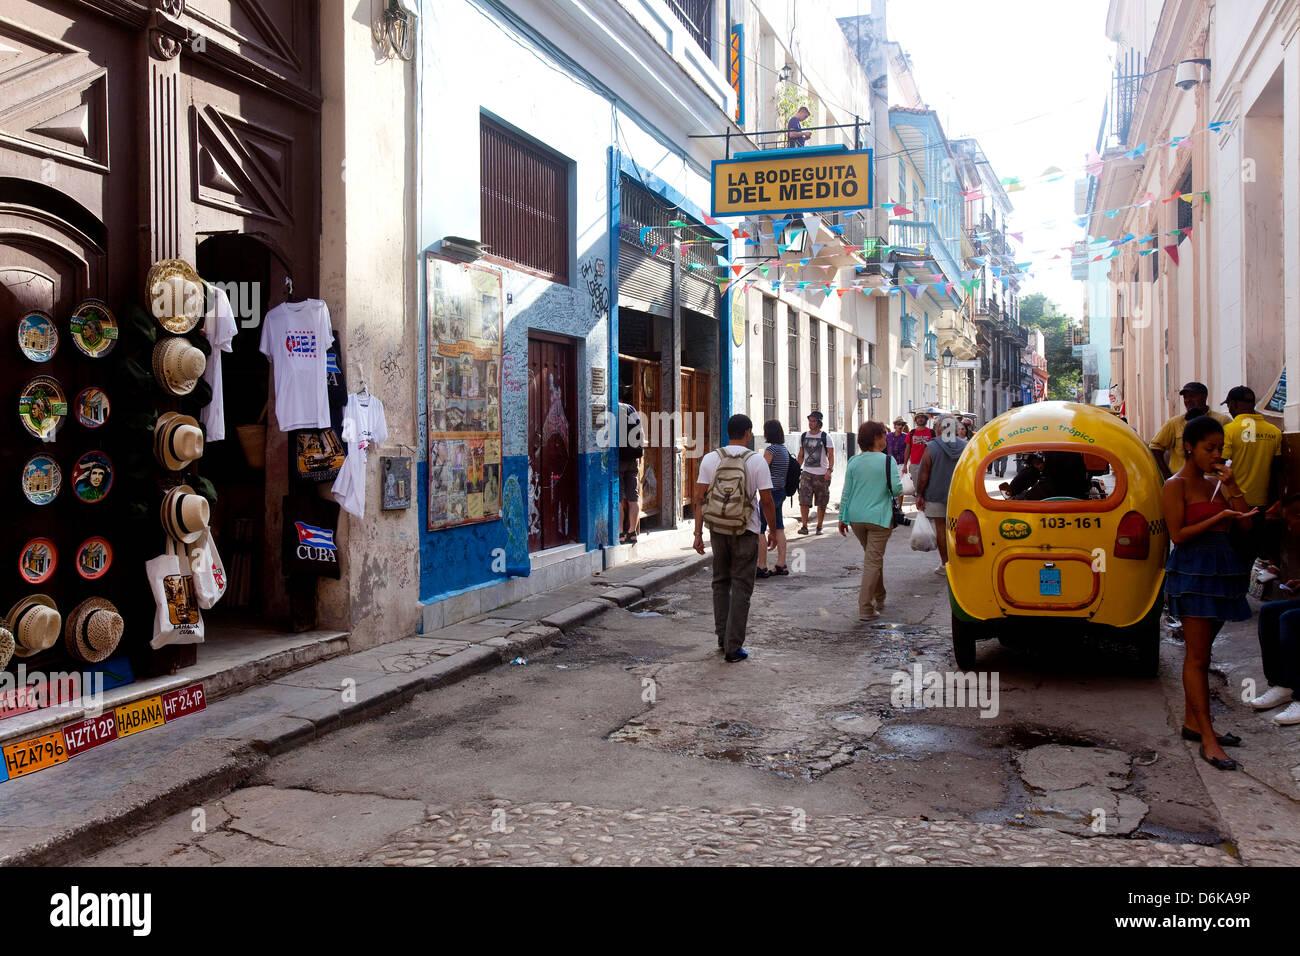 Außerhalb La Bodeguita del Medio die Hemingway bar Lieblingsorte. Kubanische Havanna, La Habana, Cuba, Südamerika, Stockbild